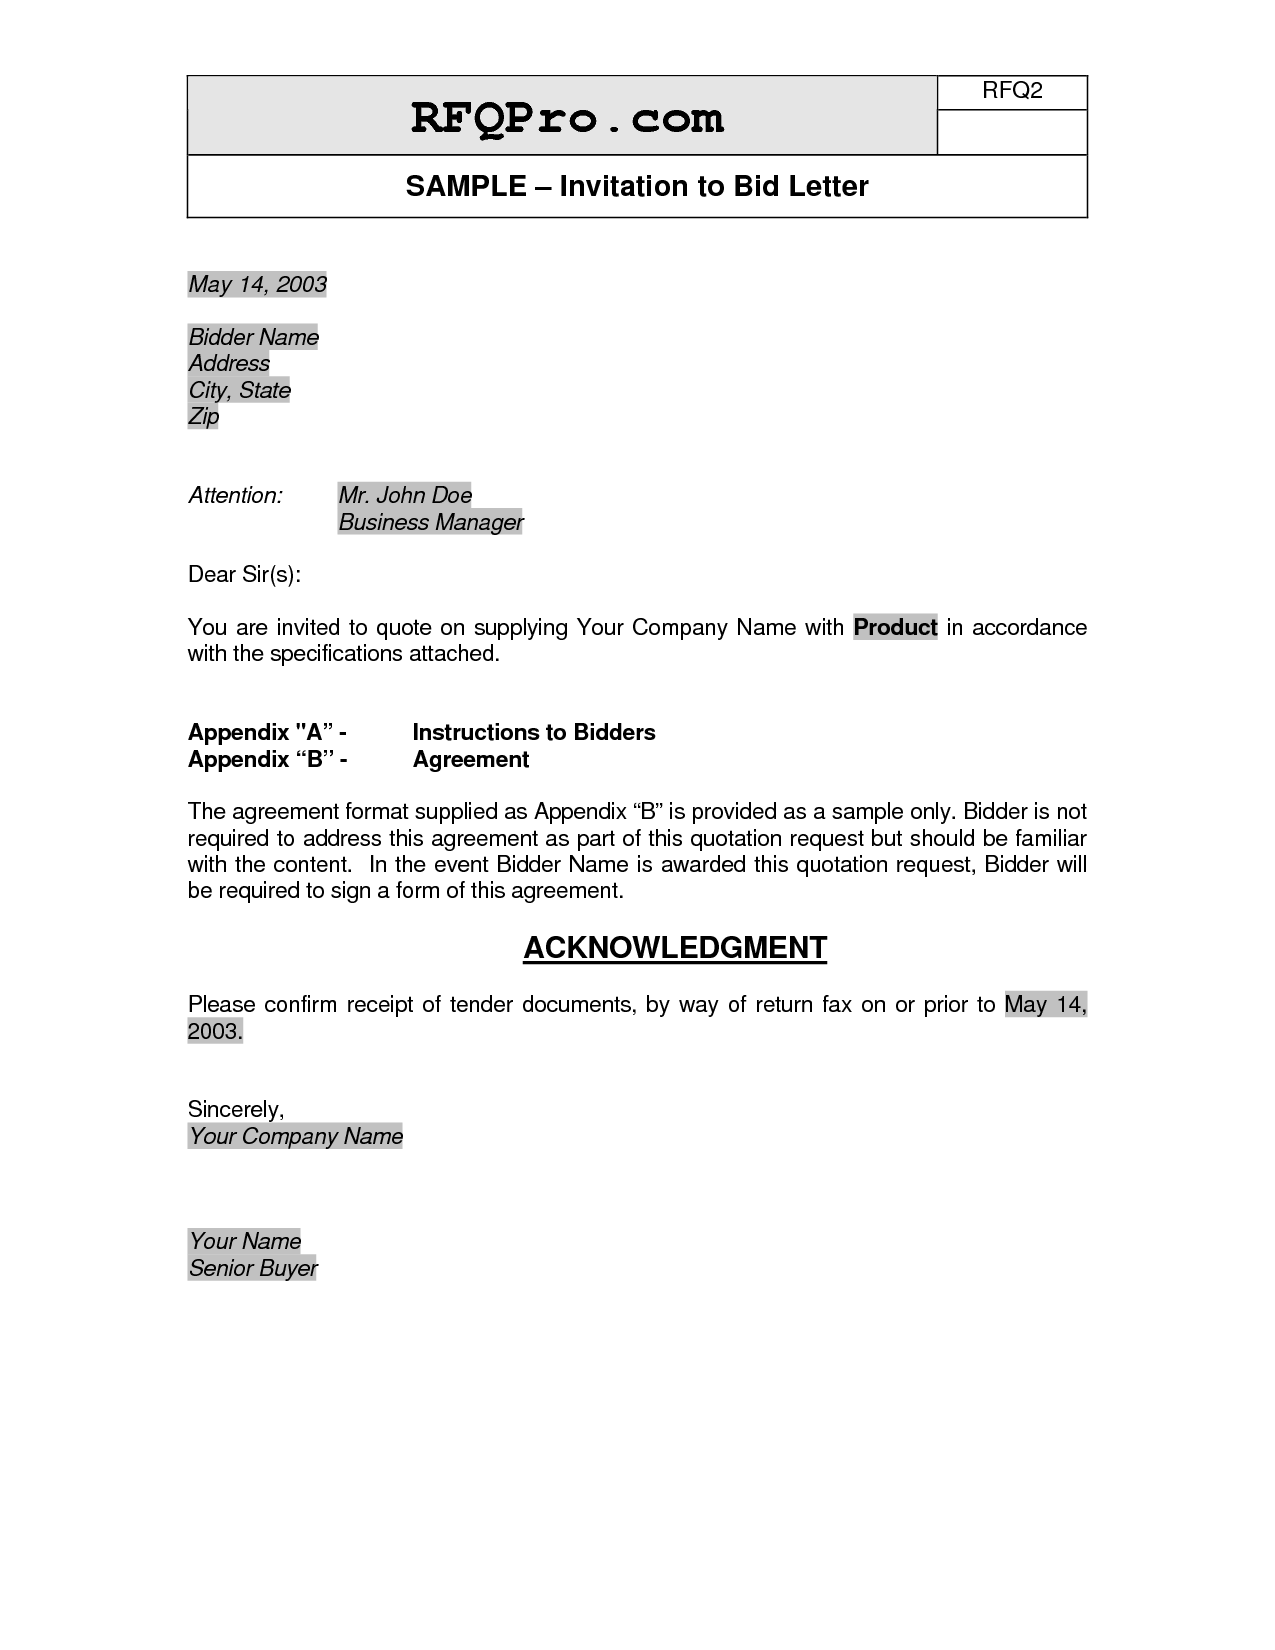 Business Invitation Letter Format Response Letter To Bid Invitation Membership Decline Letter This .